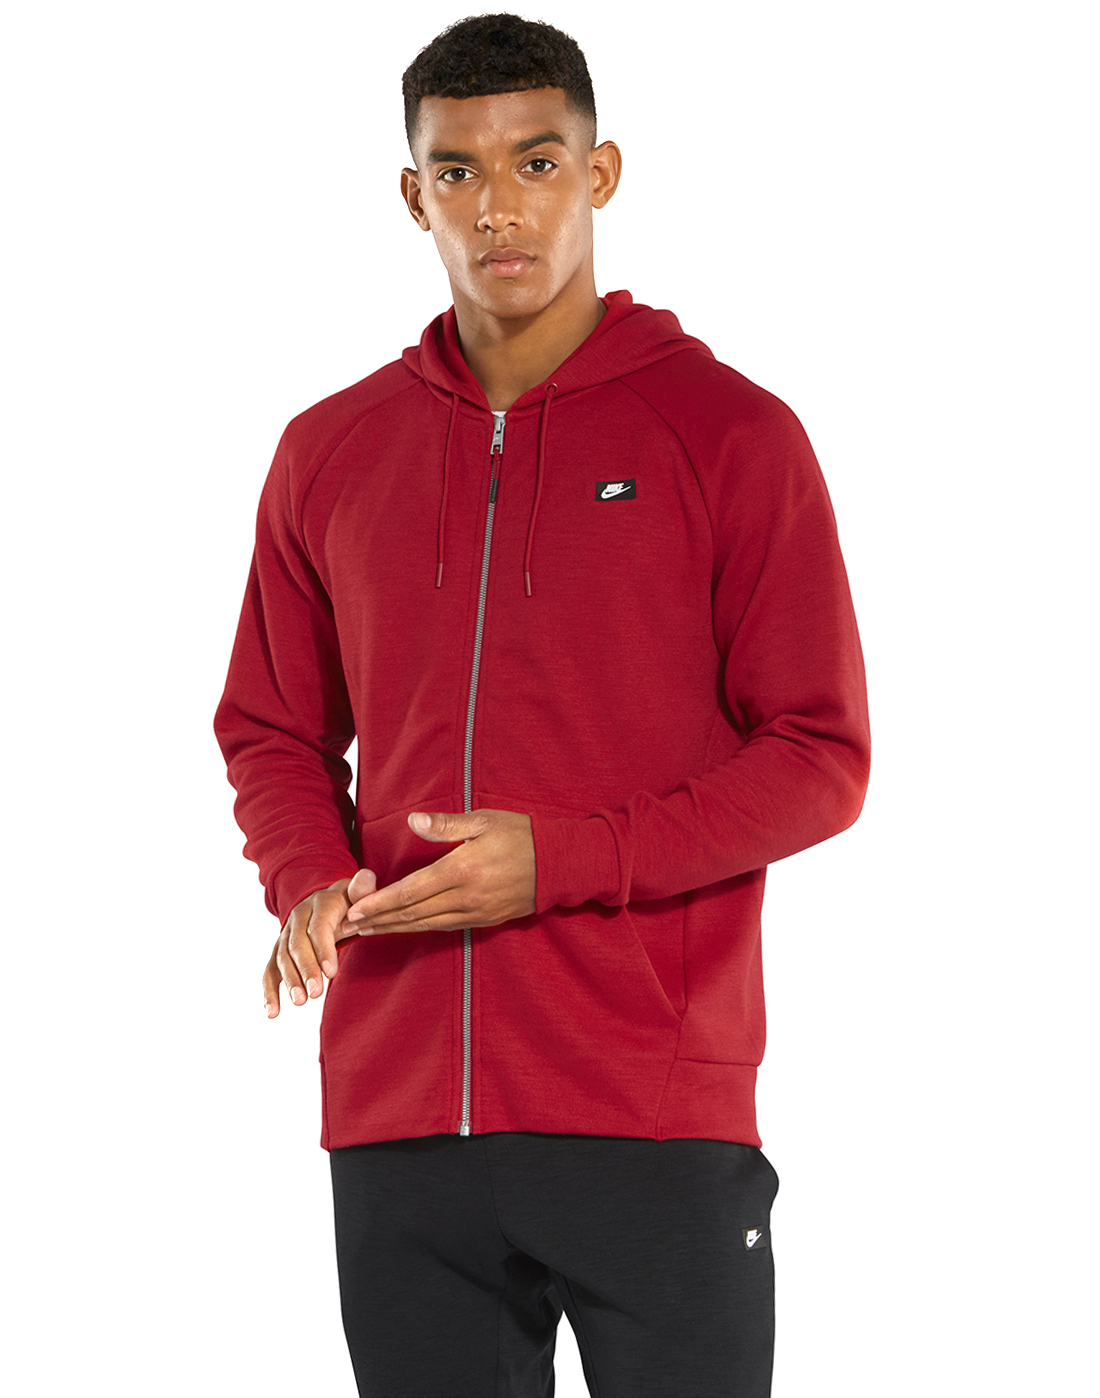 fbd59a56c3a0 Men s Red Nike Optic Full Zip Hoodie